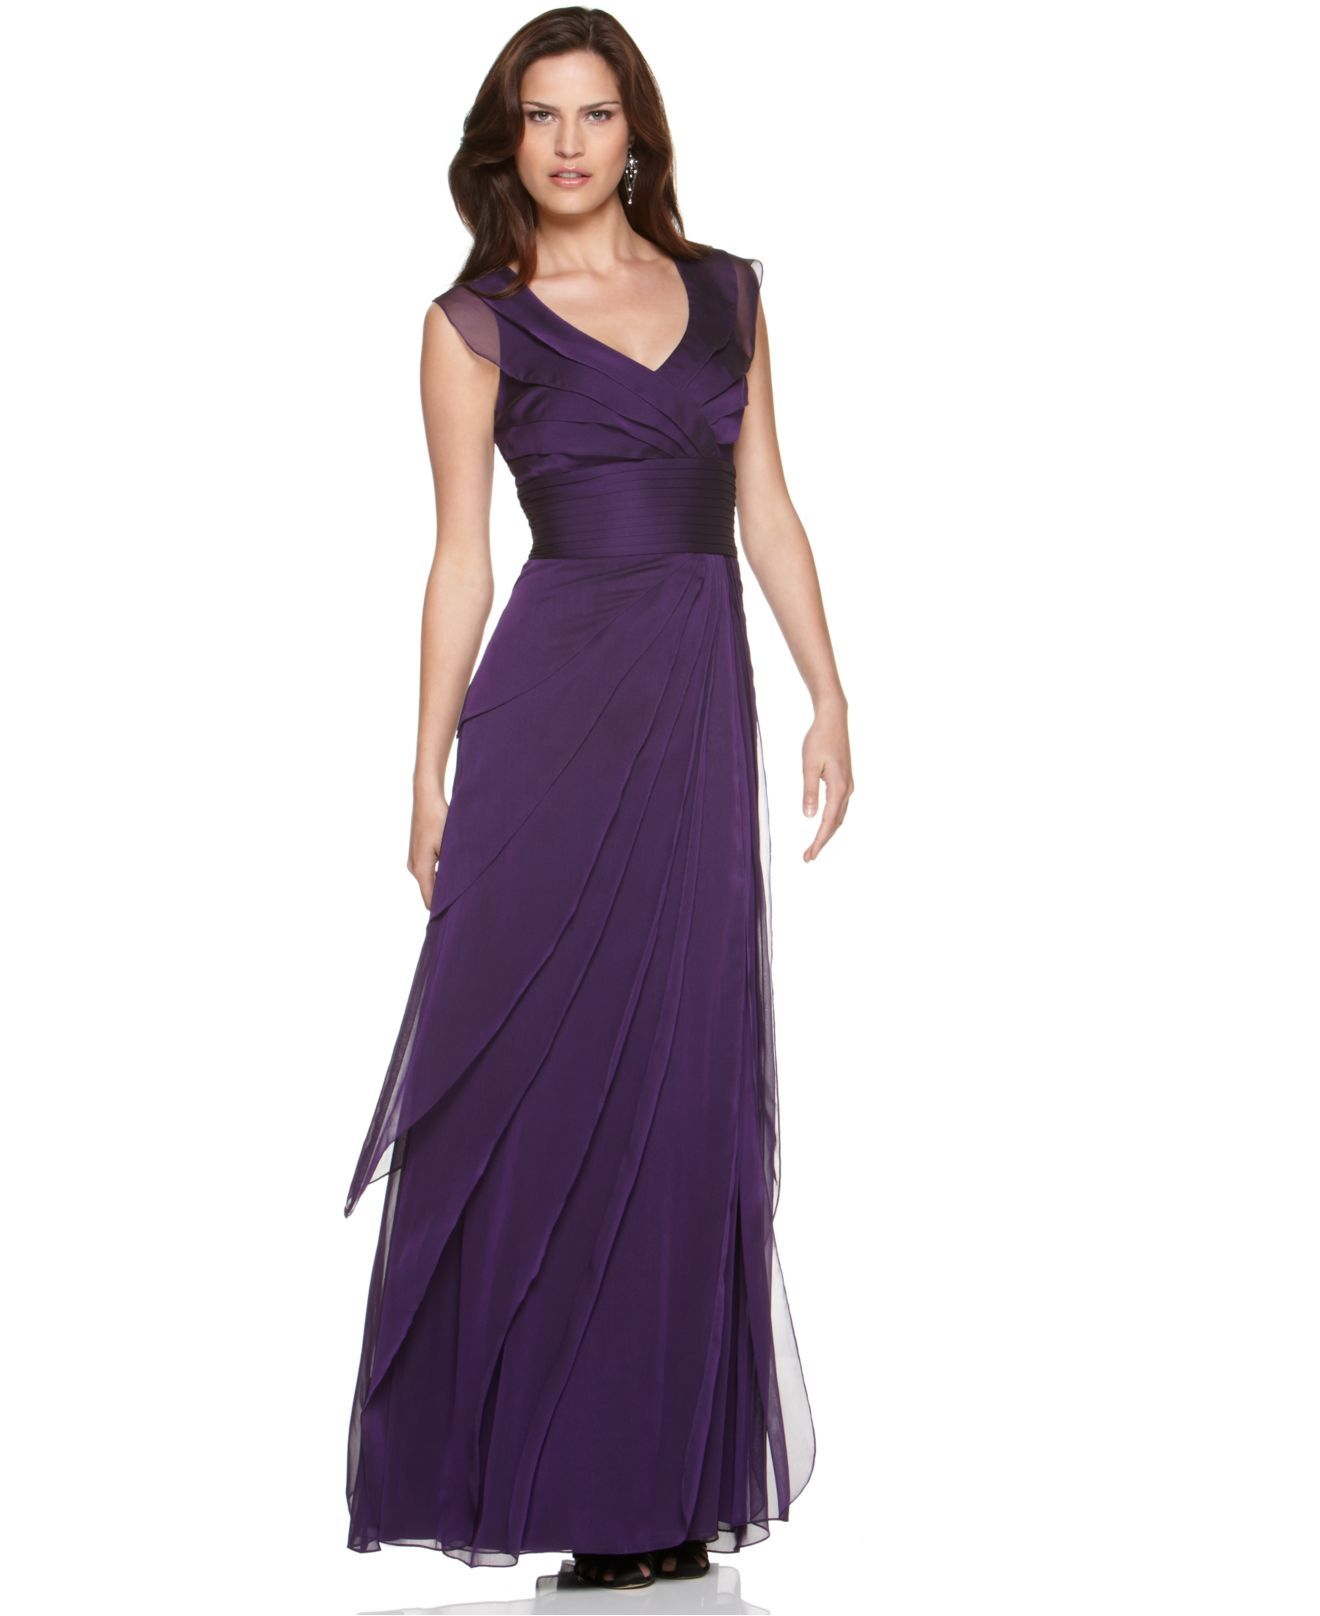 Adrianna Papell Dress, Tiered Evening Dress - Womens Dresses ...